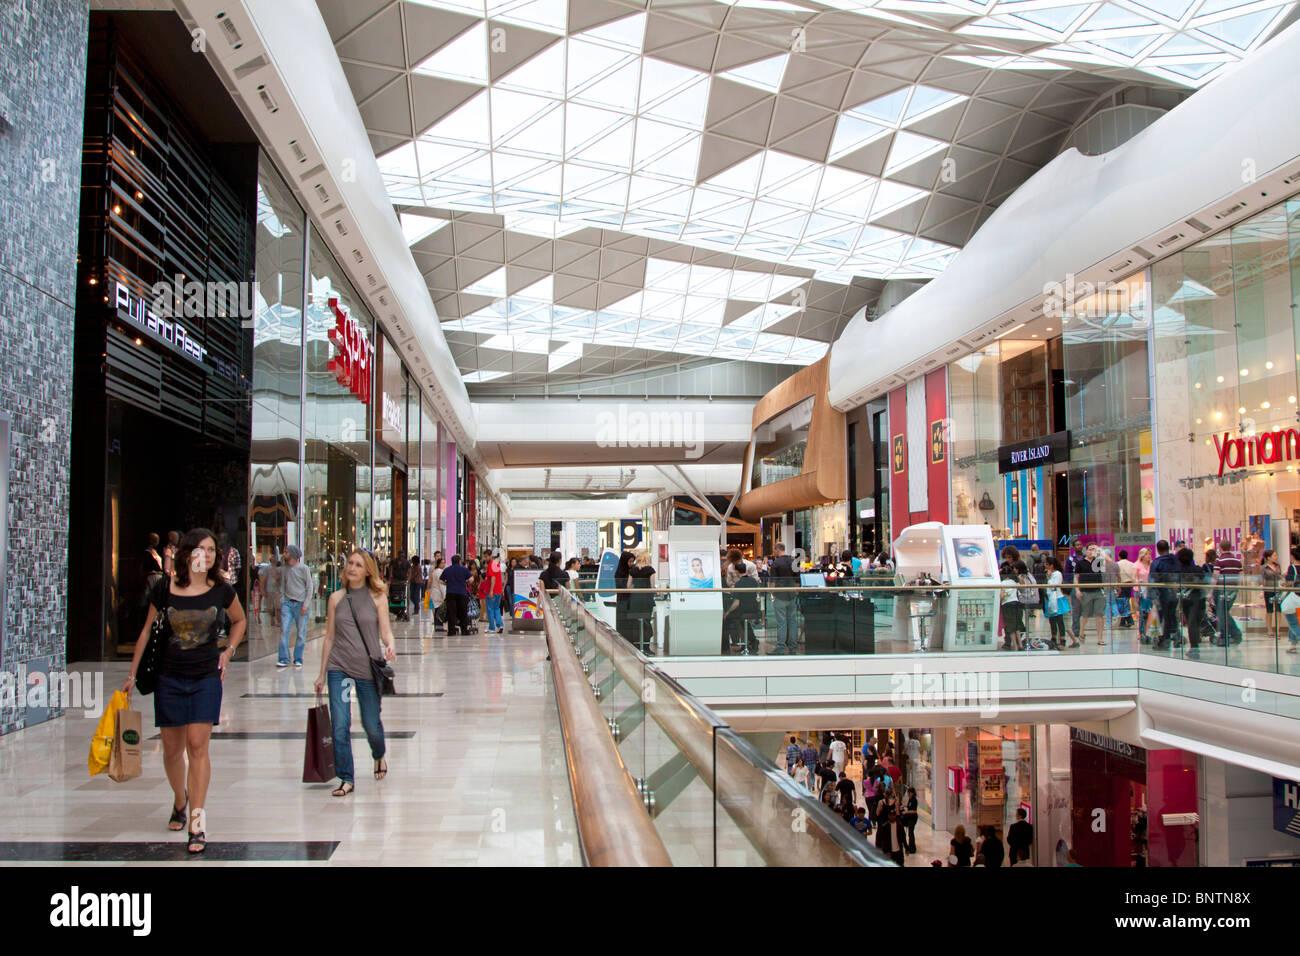 Westfield Shopping Centre - Shepherd's Bush - London - Stock Image